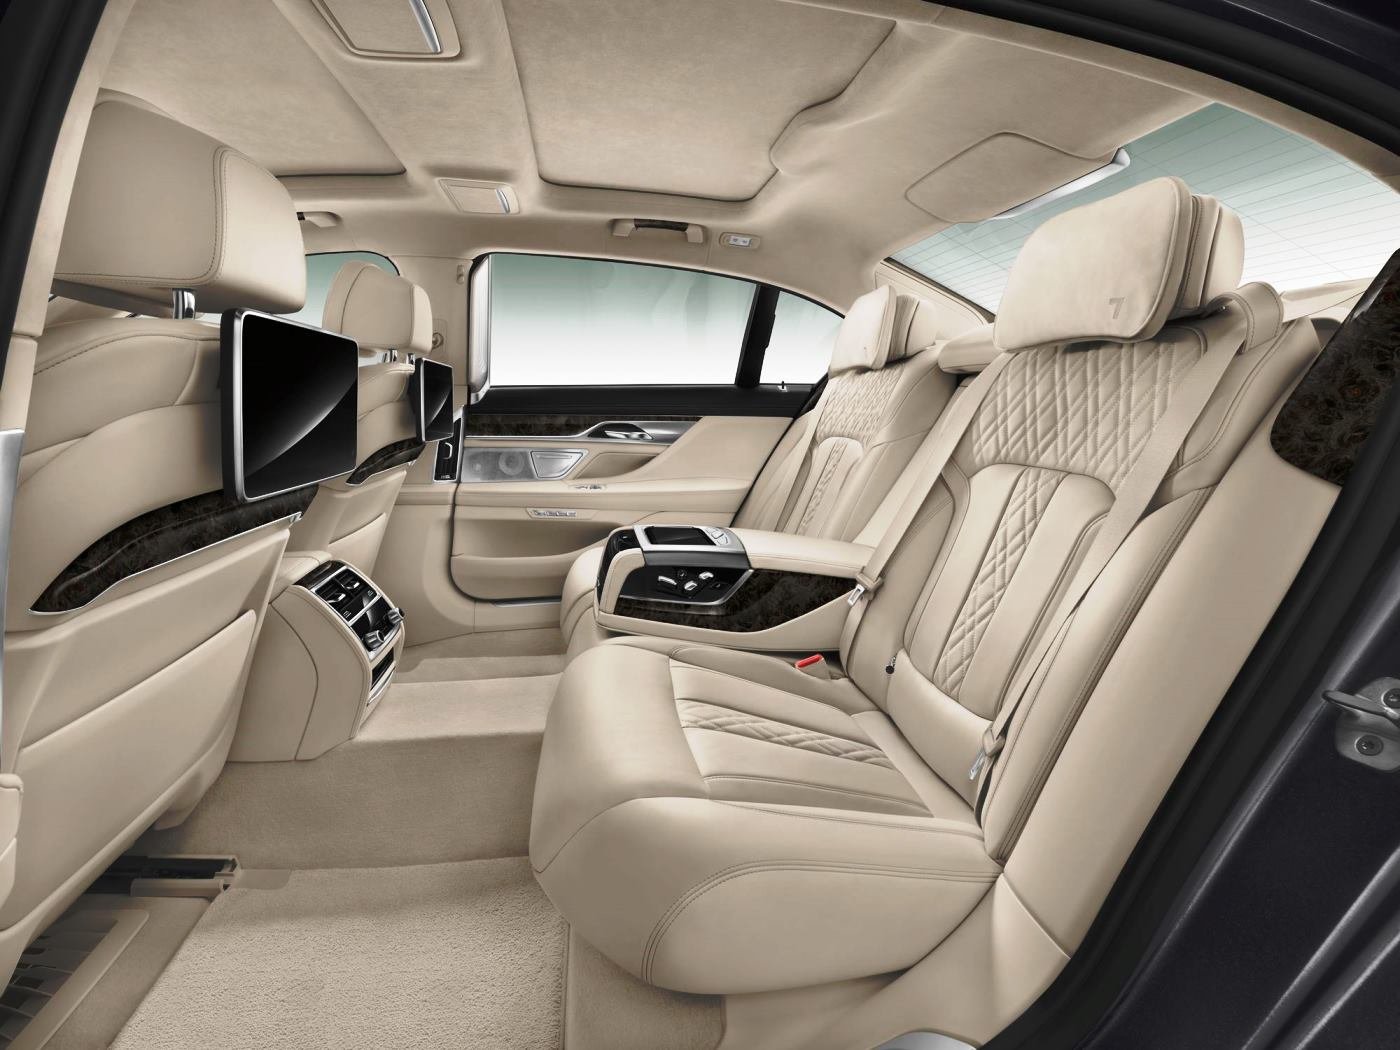 2016 BMW 7 Series Interior Photos 10